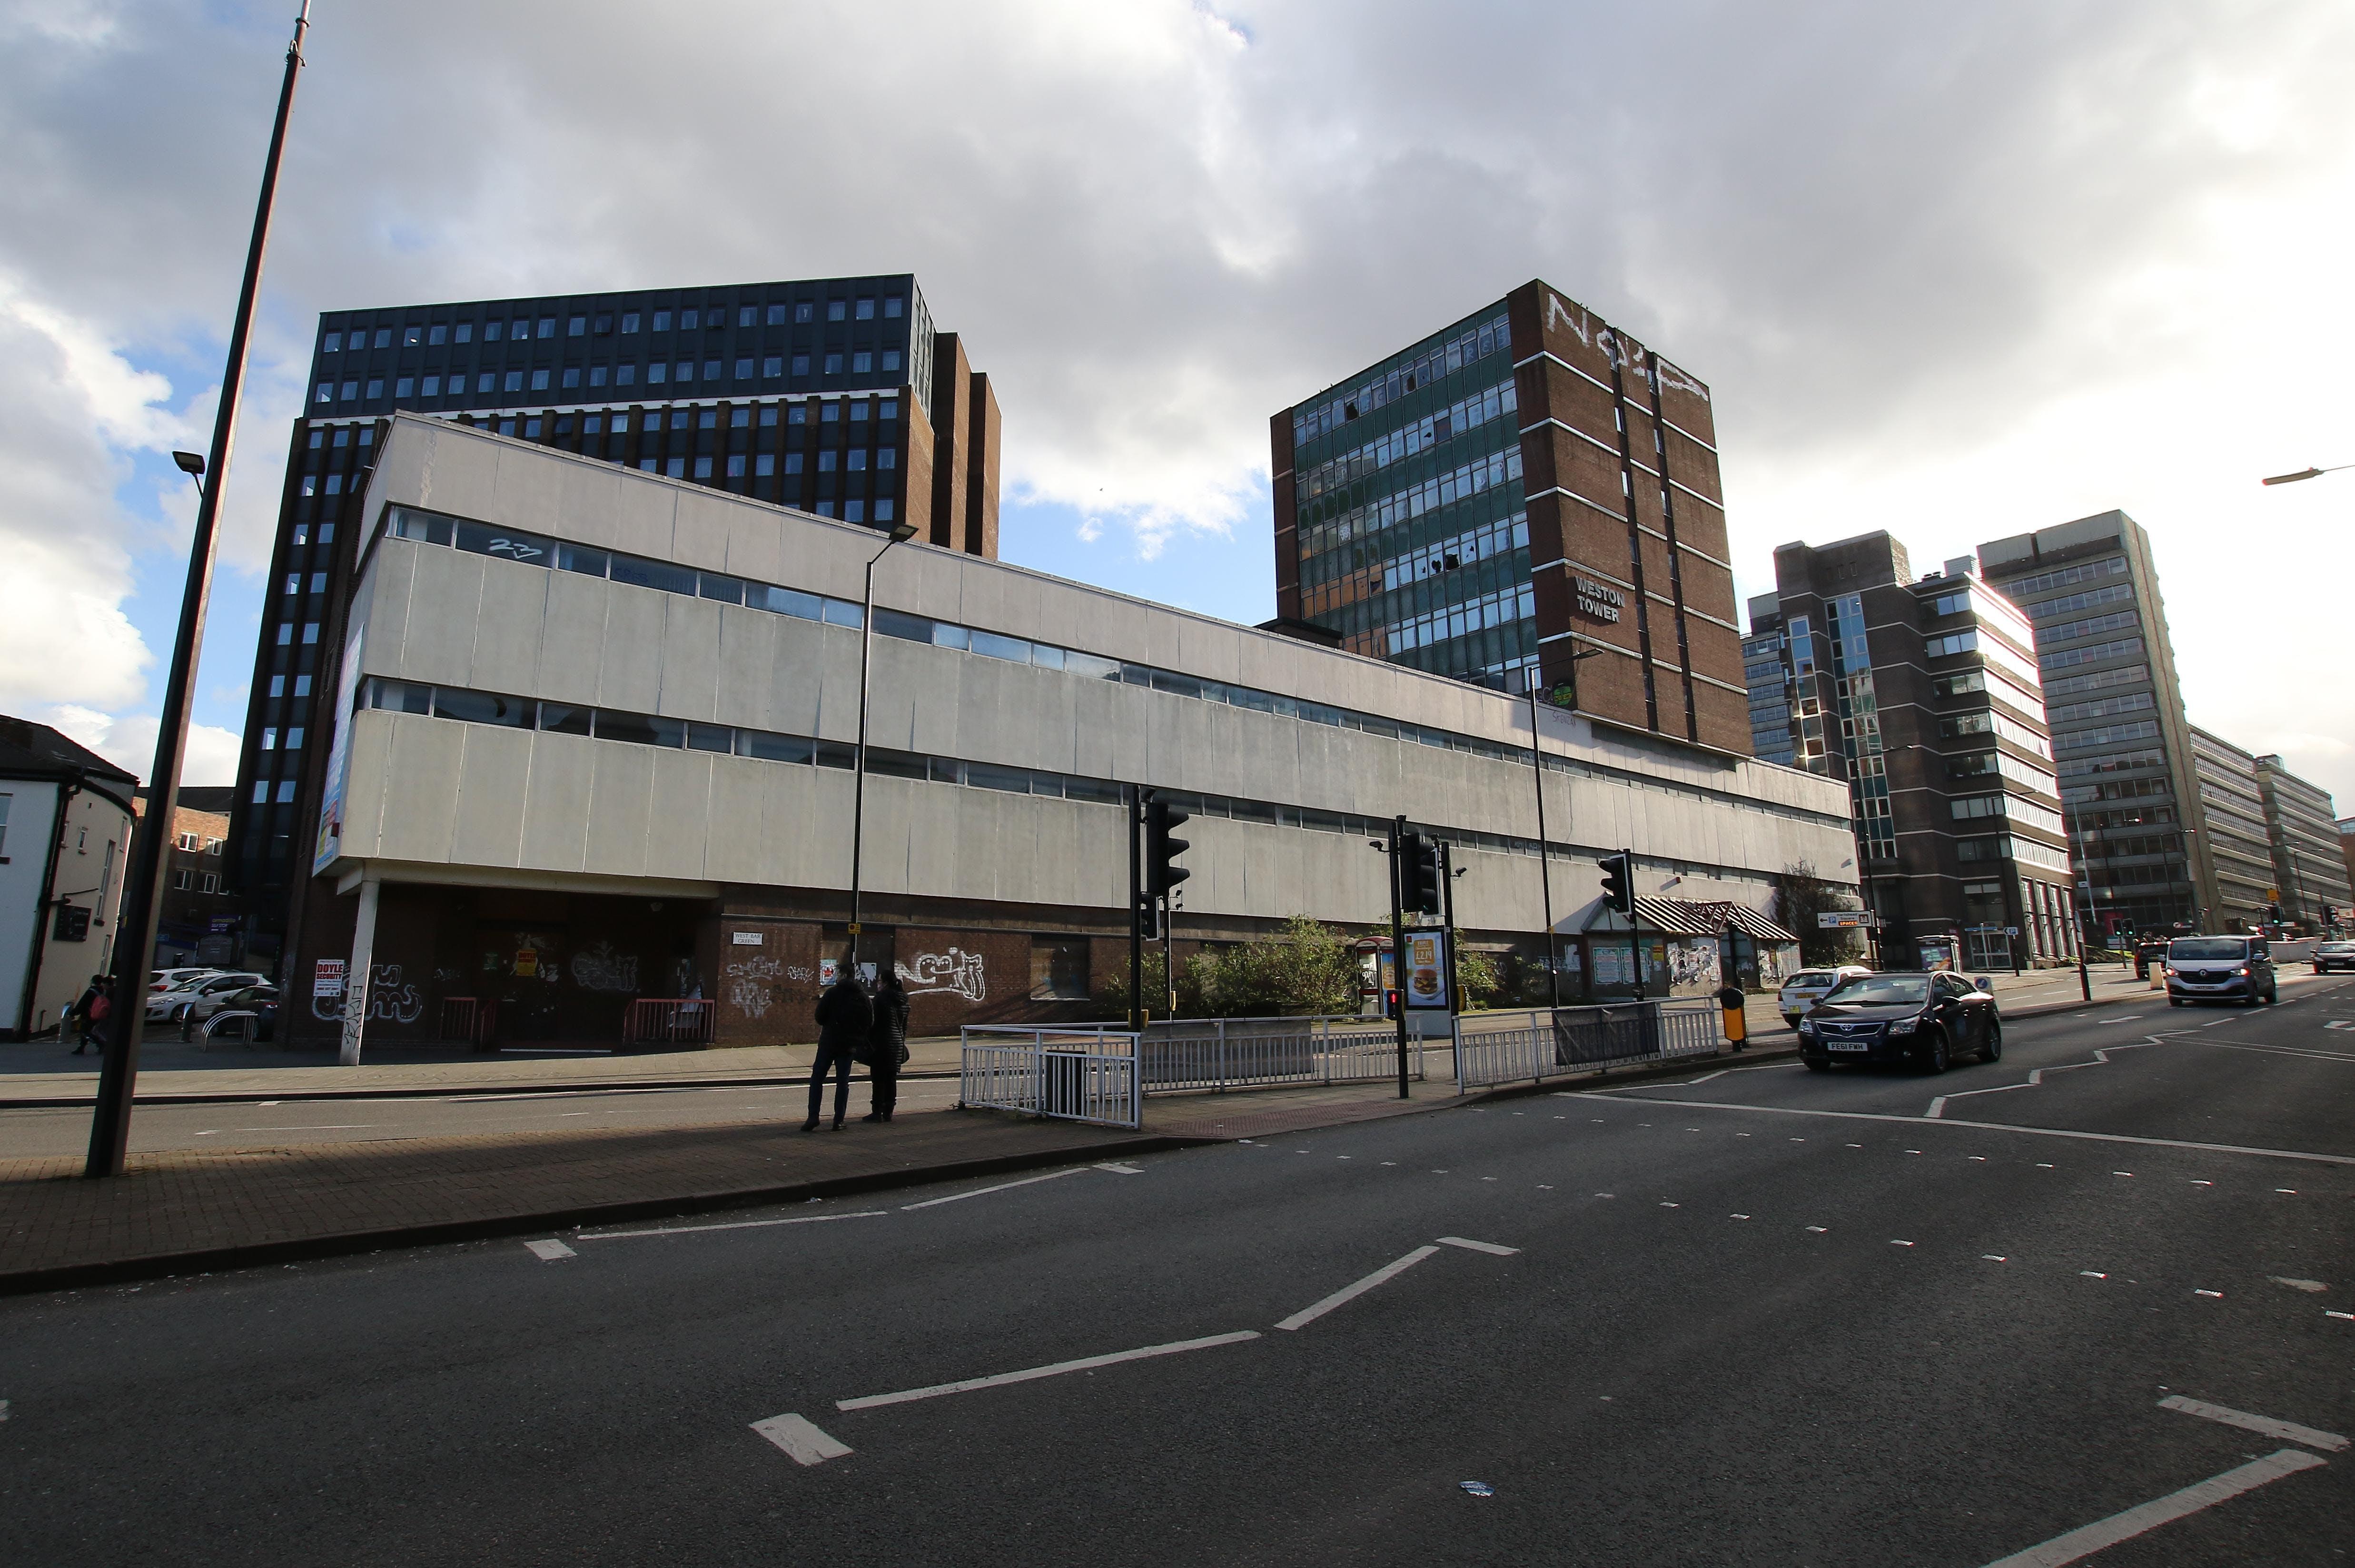 Weston Tower, Sheffield City Centre, Sheffield For Sale - Weston - Image 3.JPG